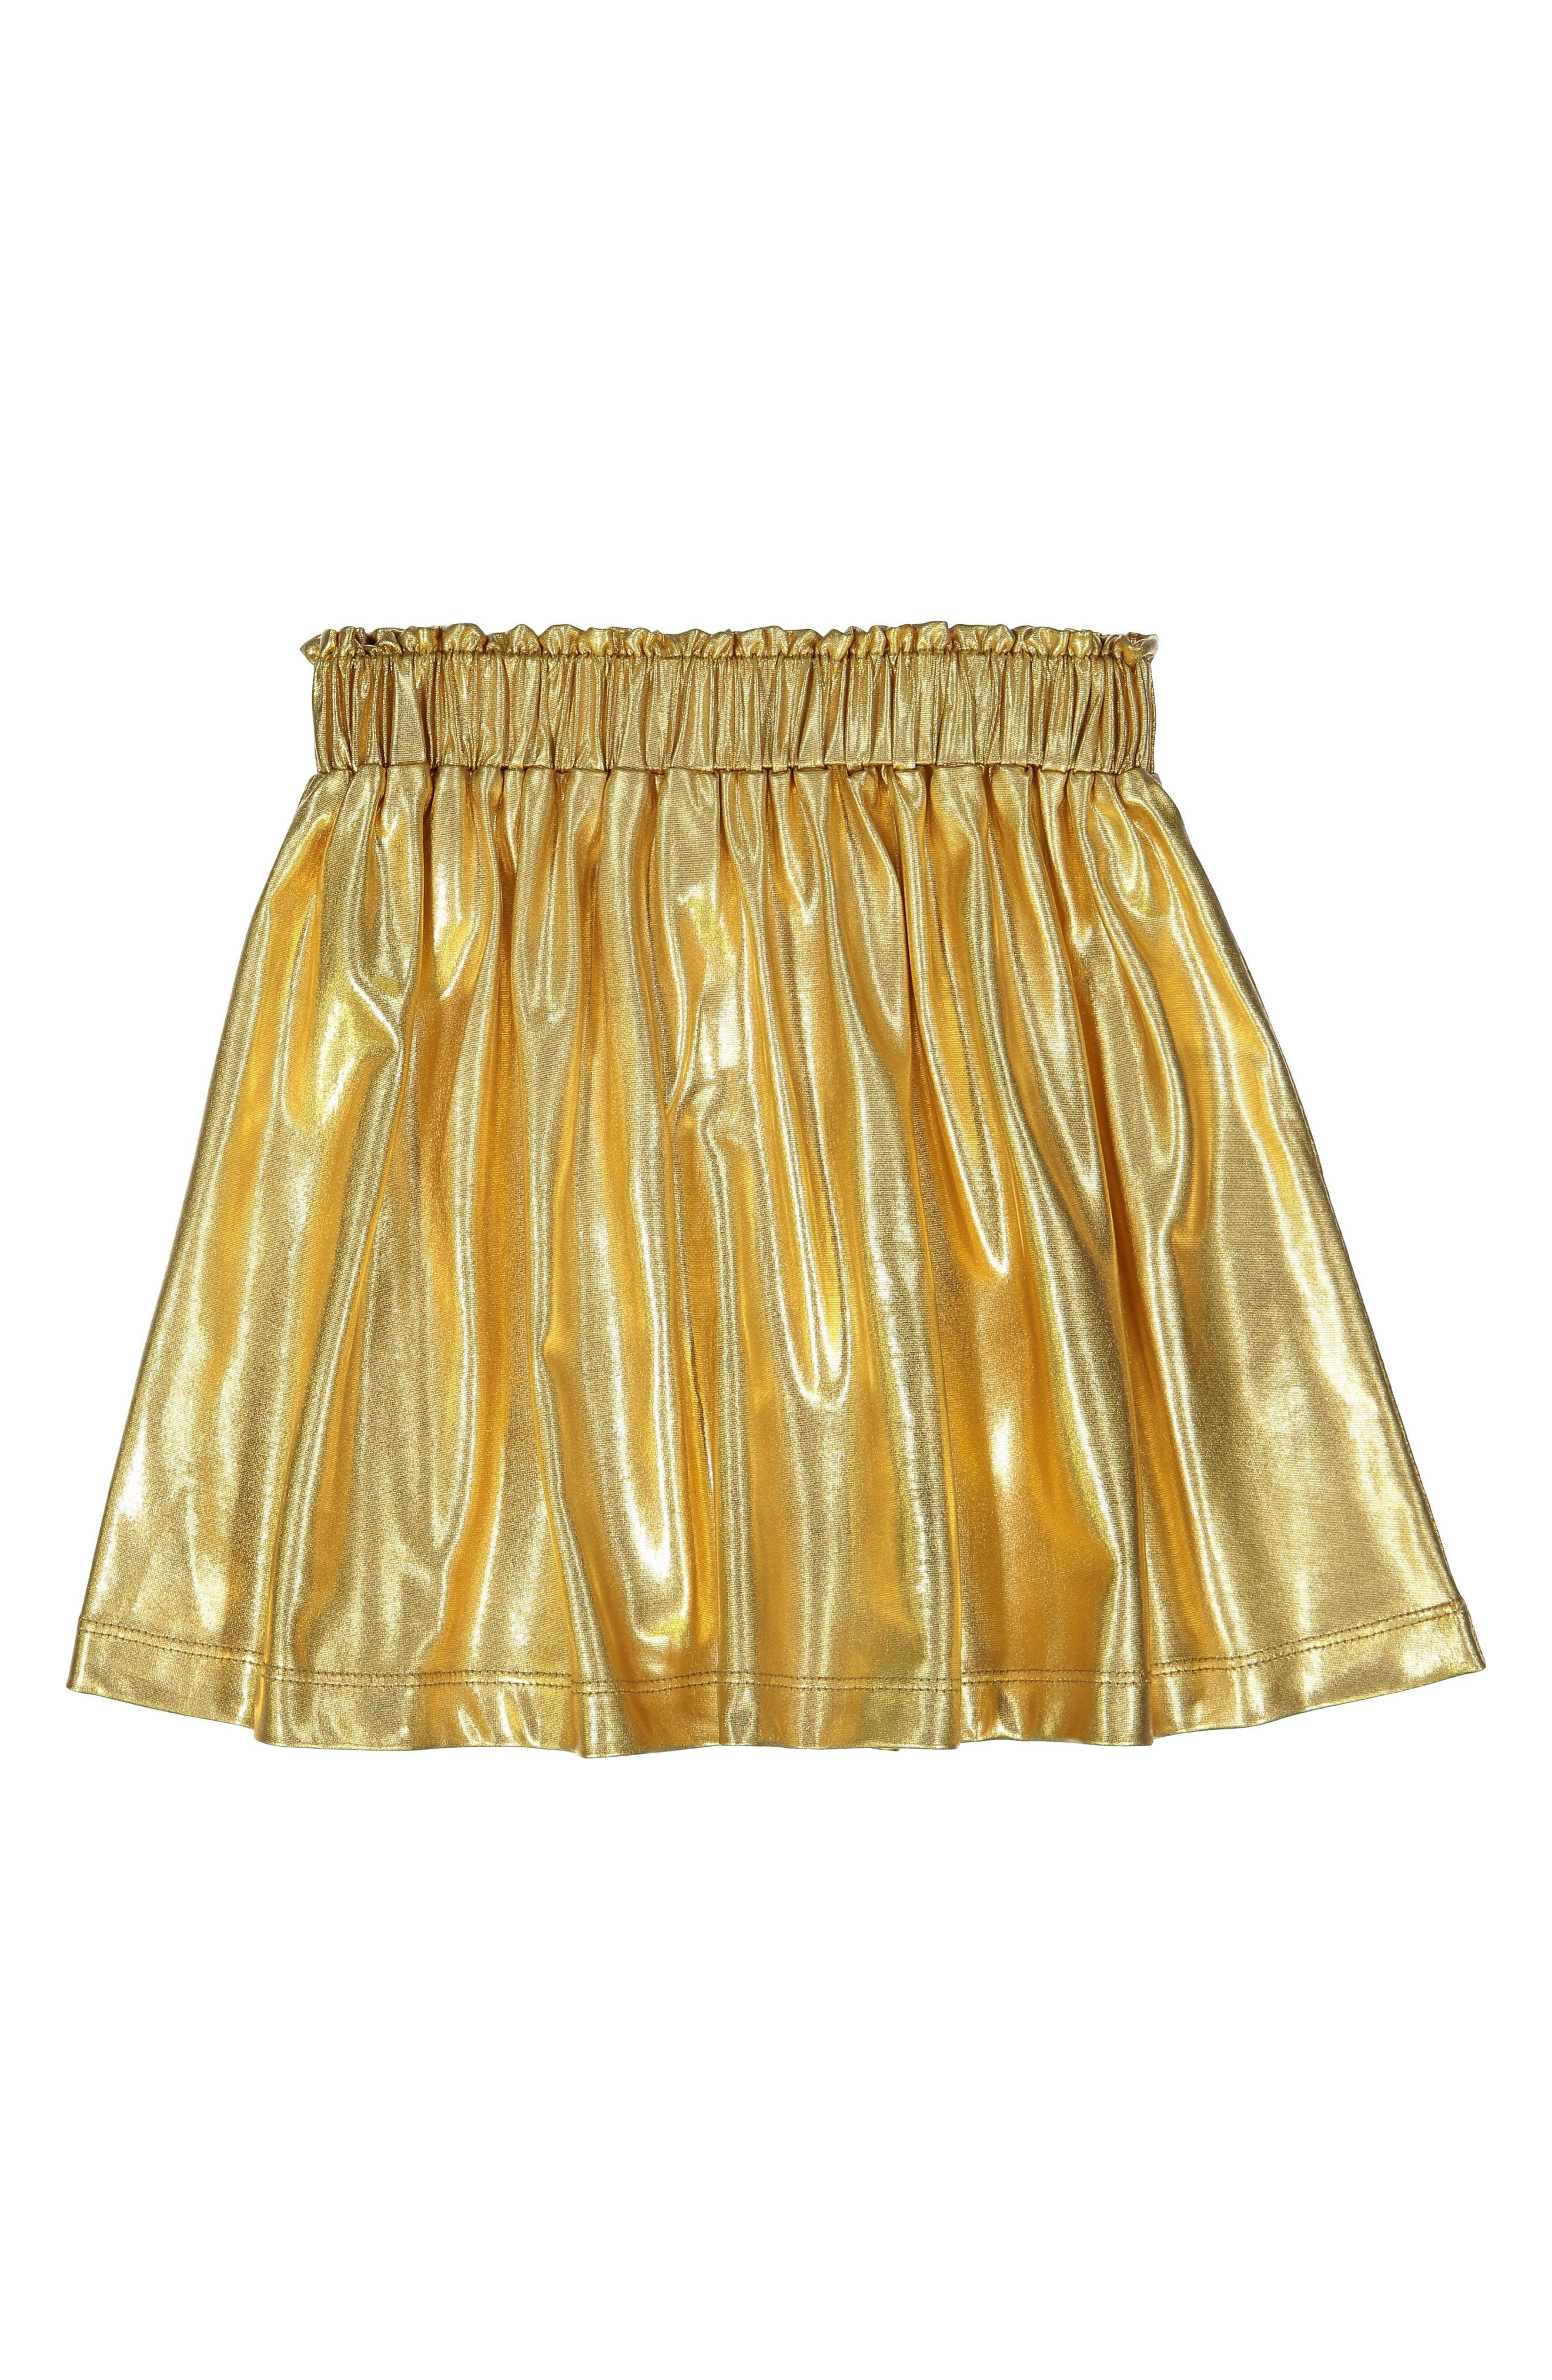 Gold Metallic Skirt,                             Main thumbnail 1, color,                             GOLD